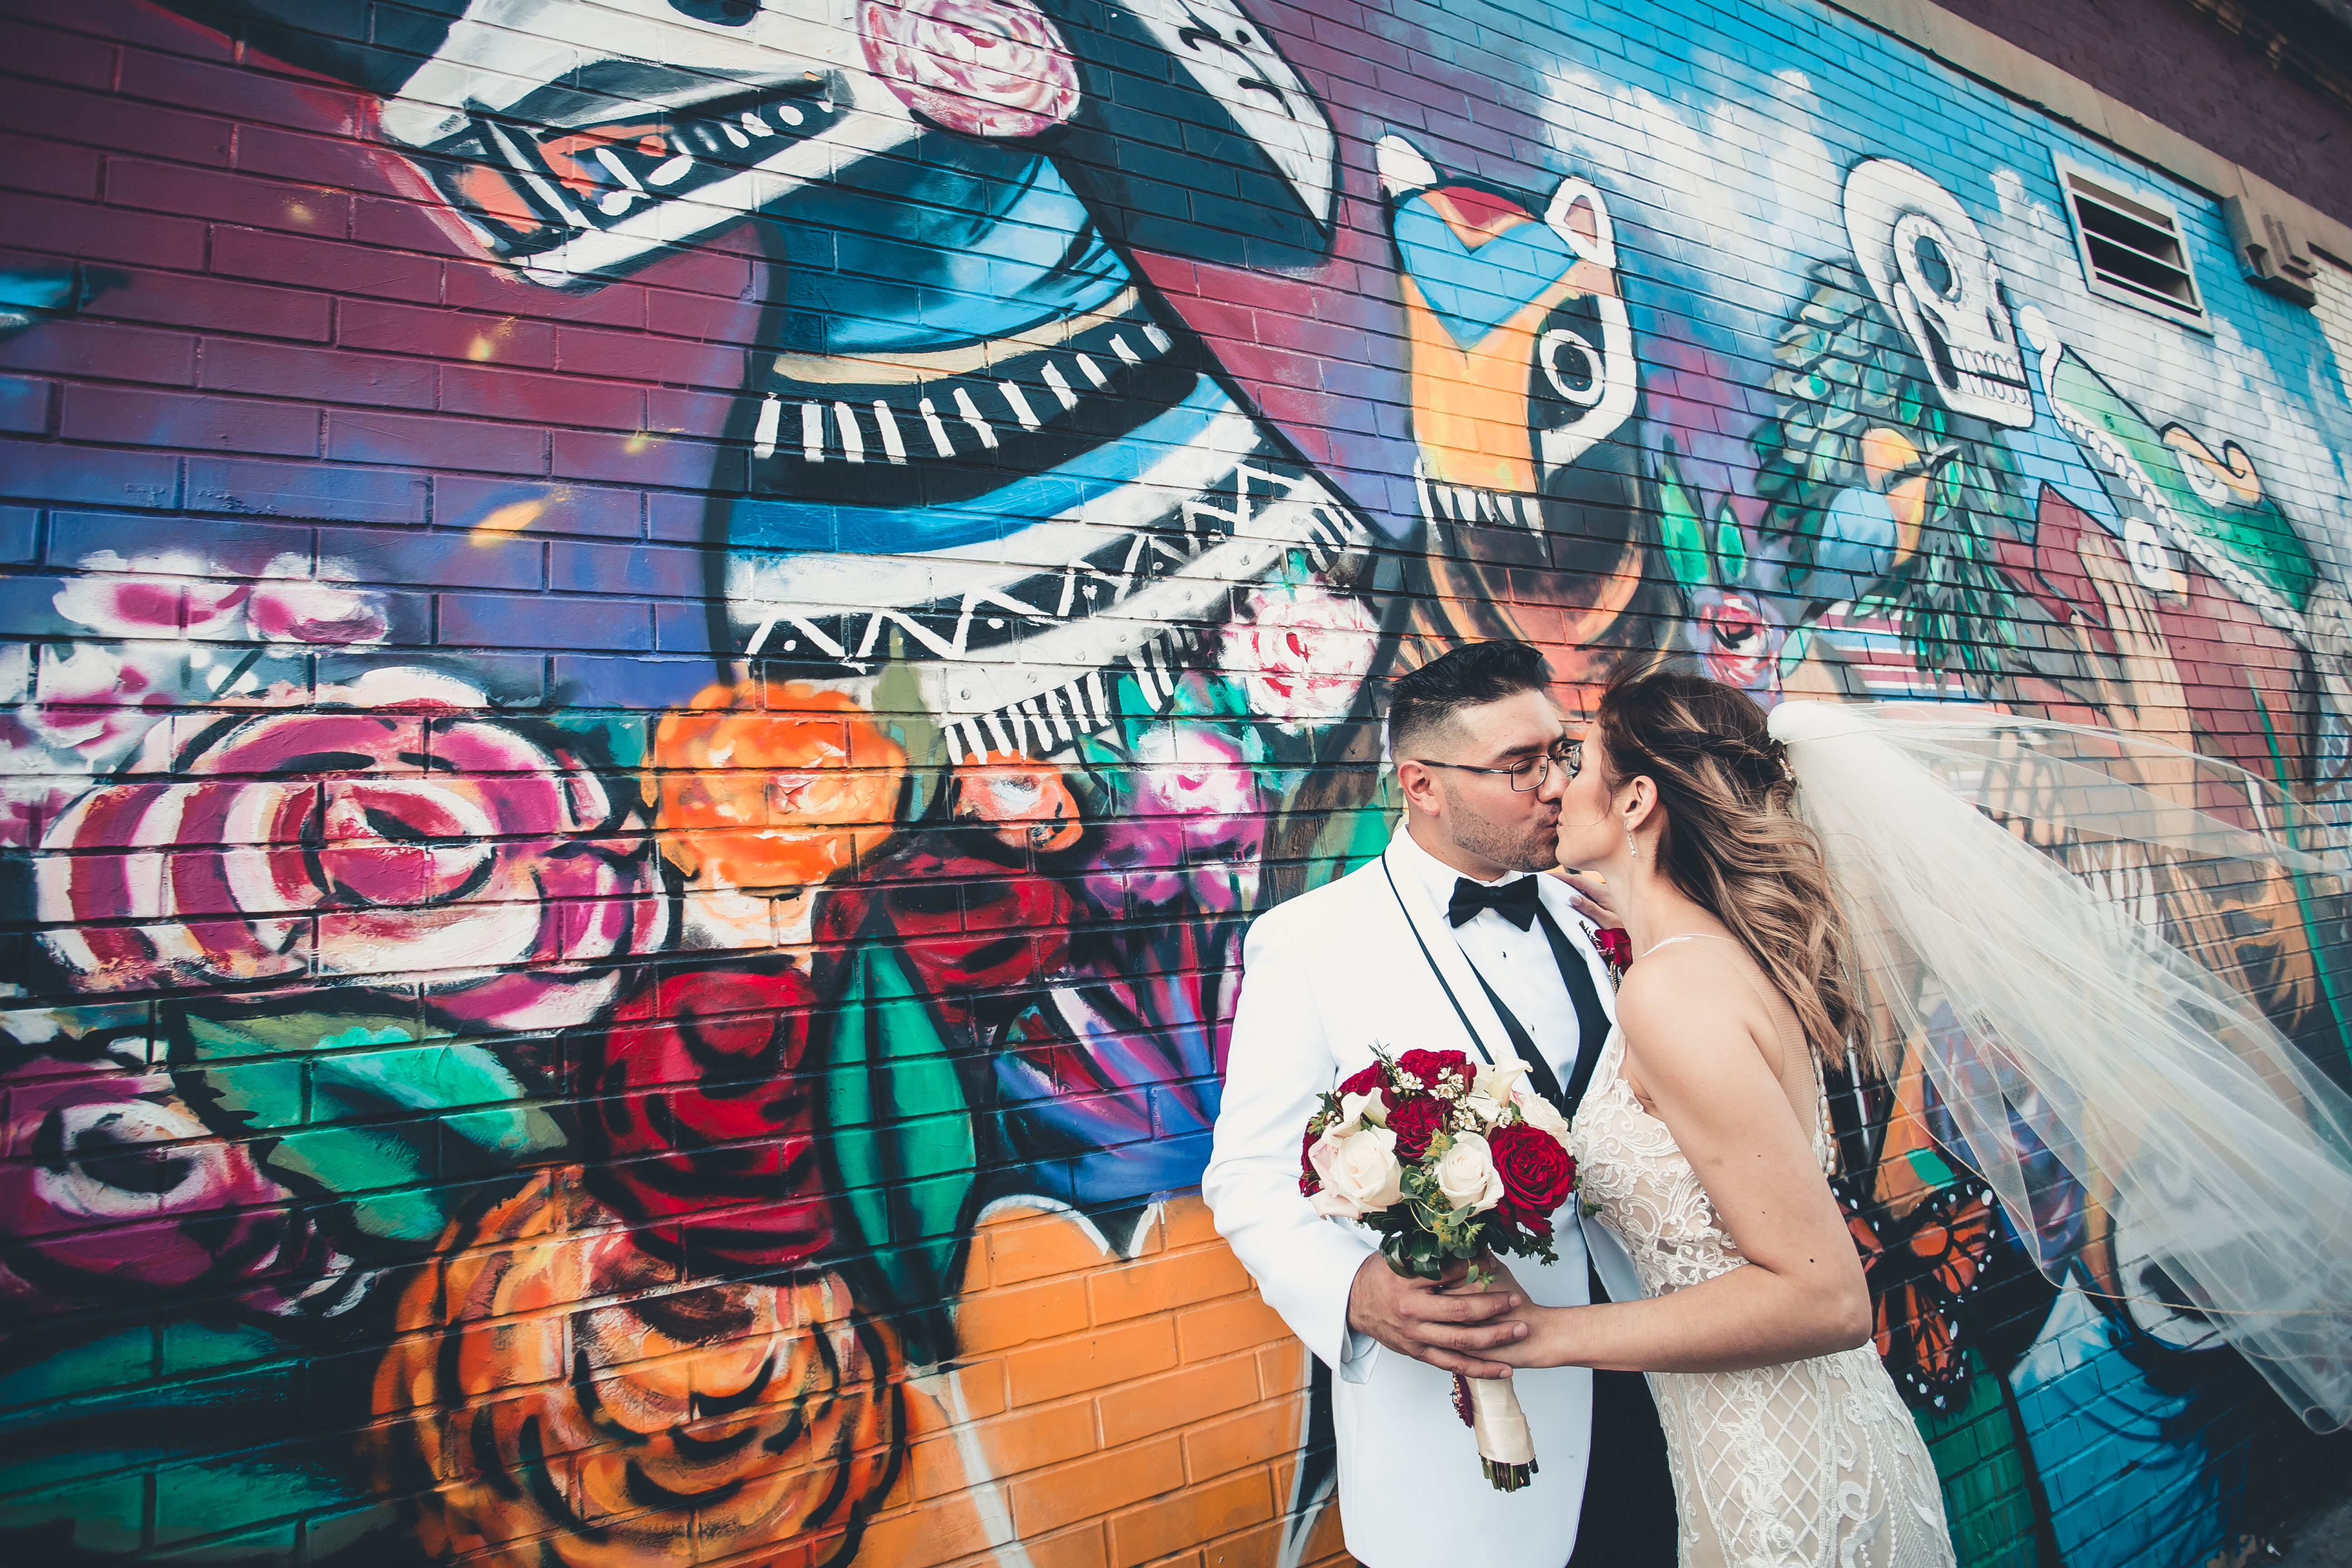 Pin By Avina Photography On Yolanda Adan Wedding Chicago Photography Street Art Photography